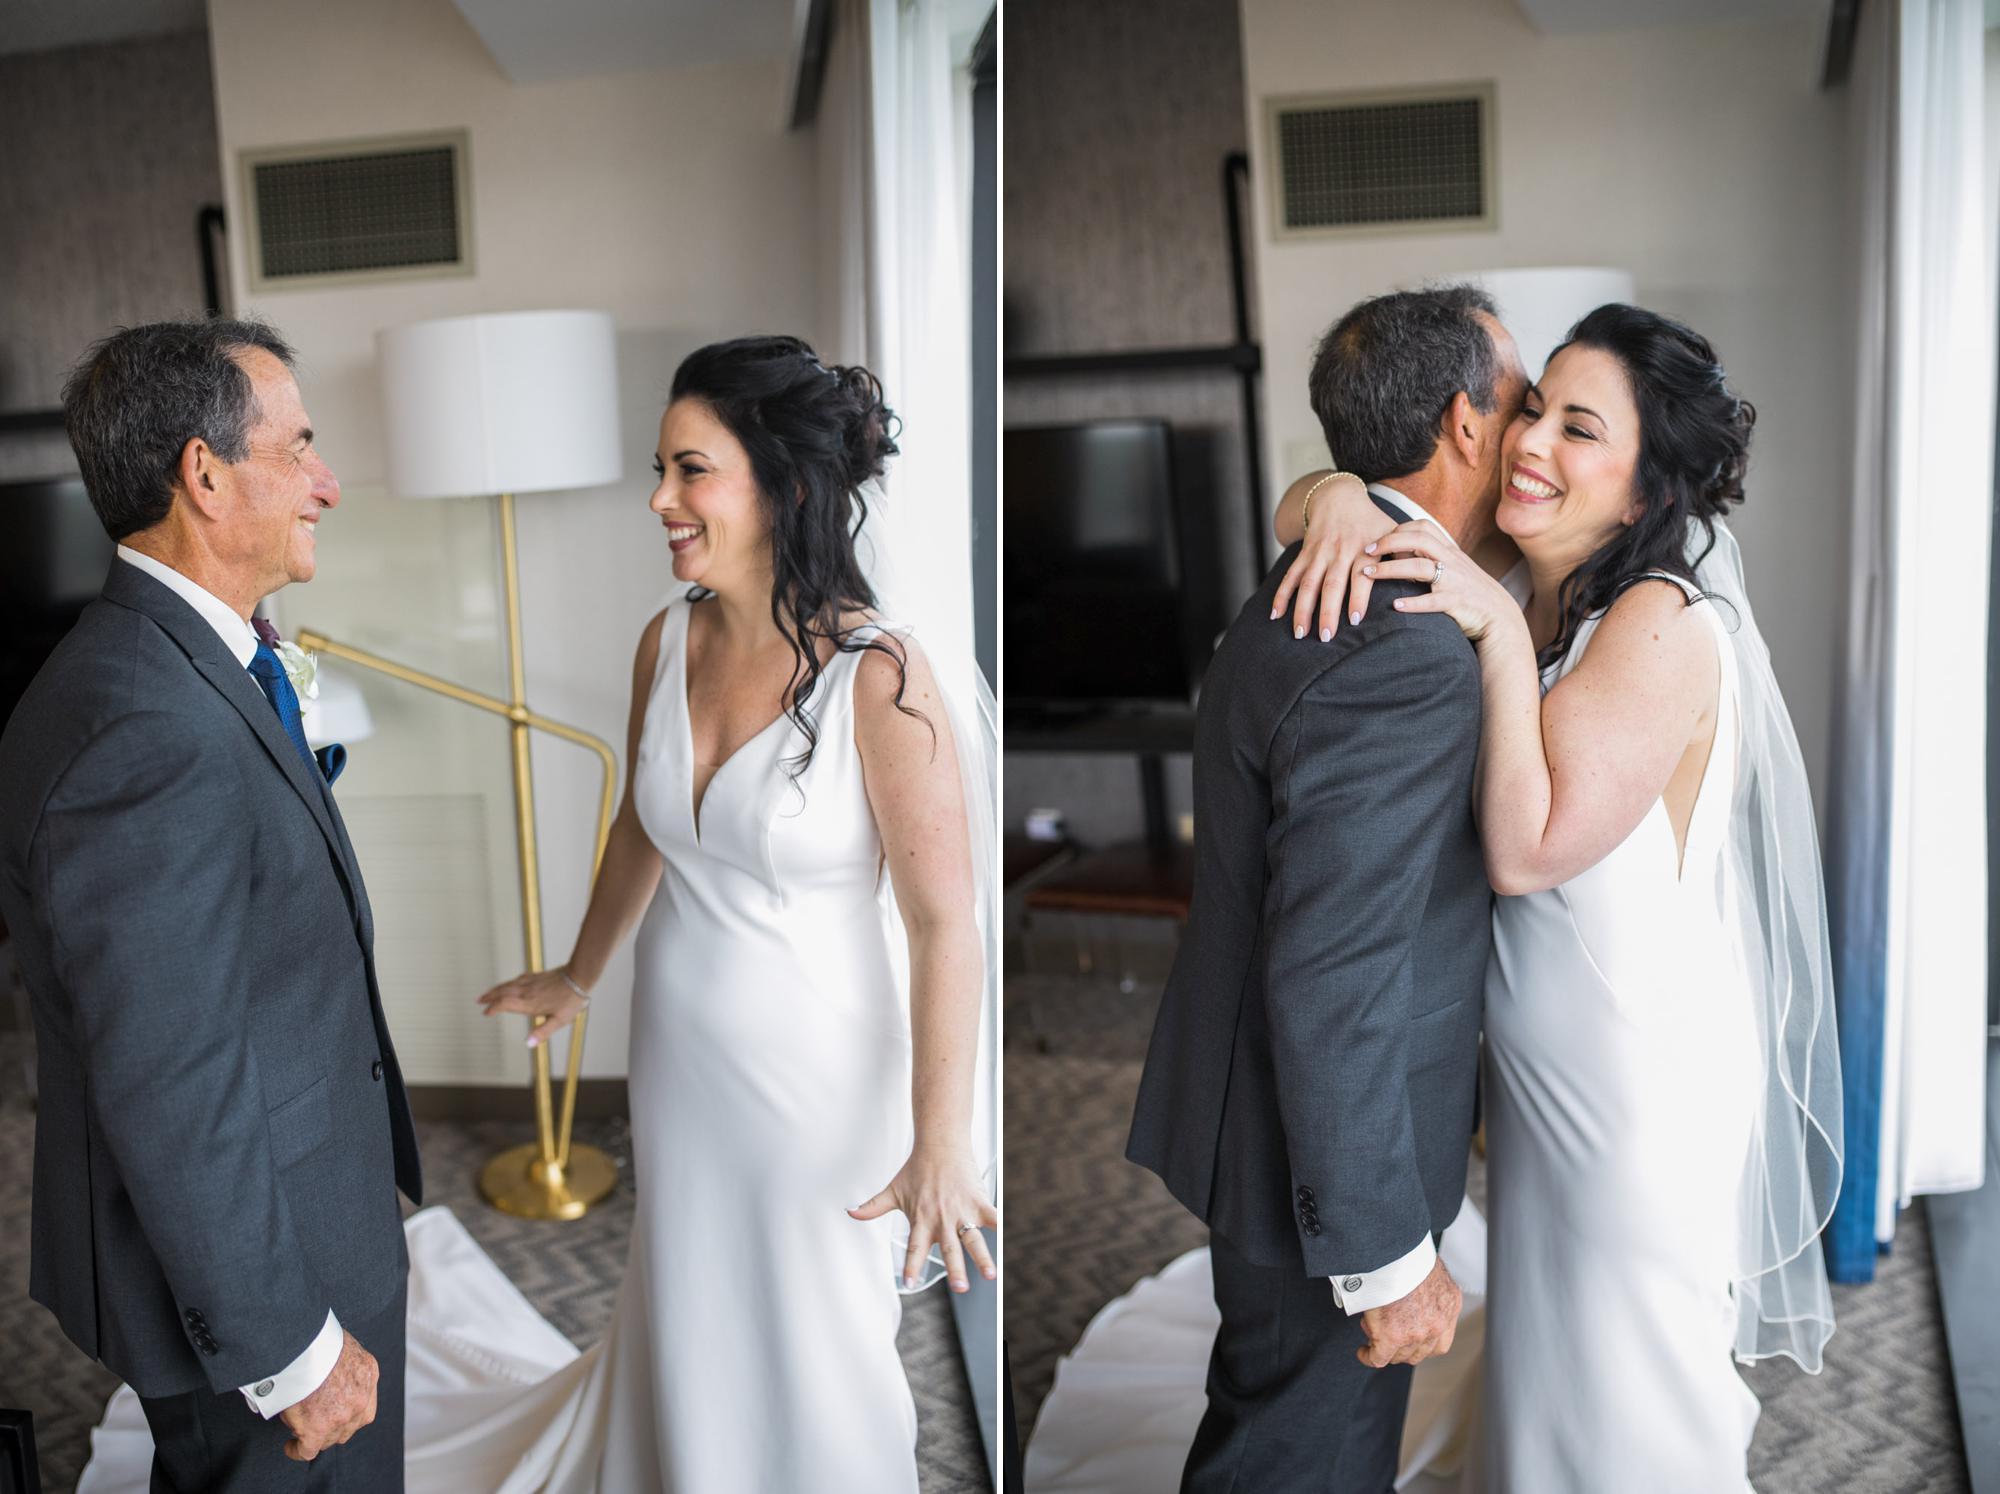 renaissance-hotel-toledo-wedding-162.jpg